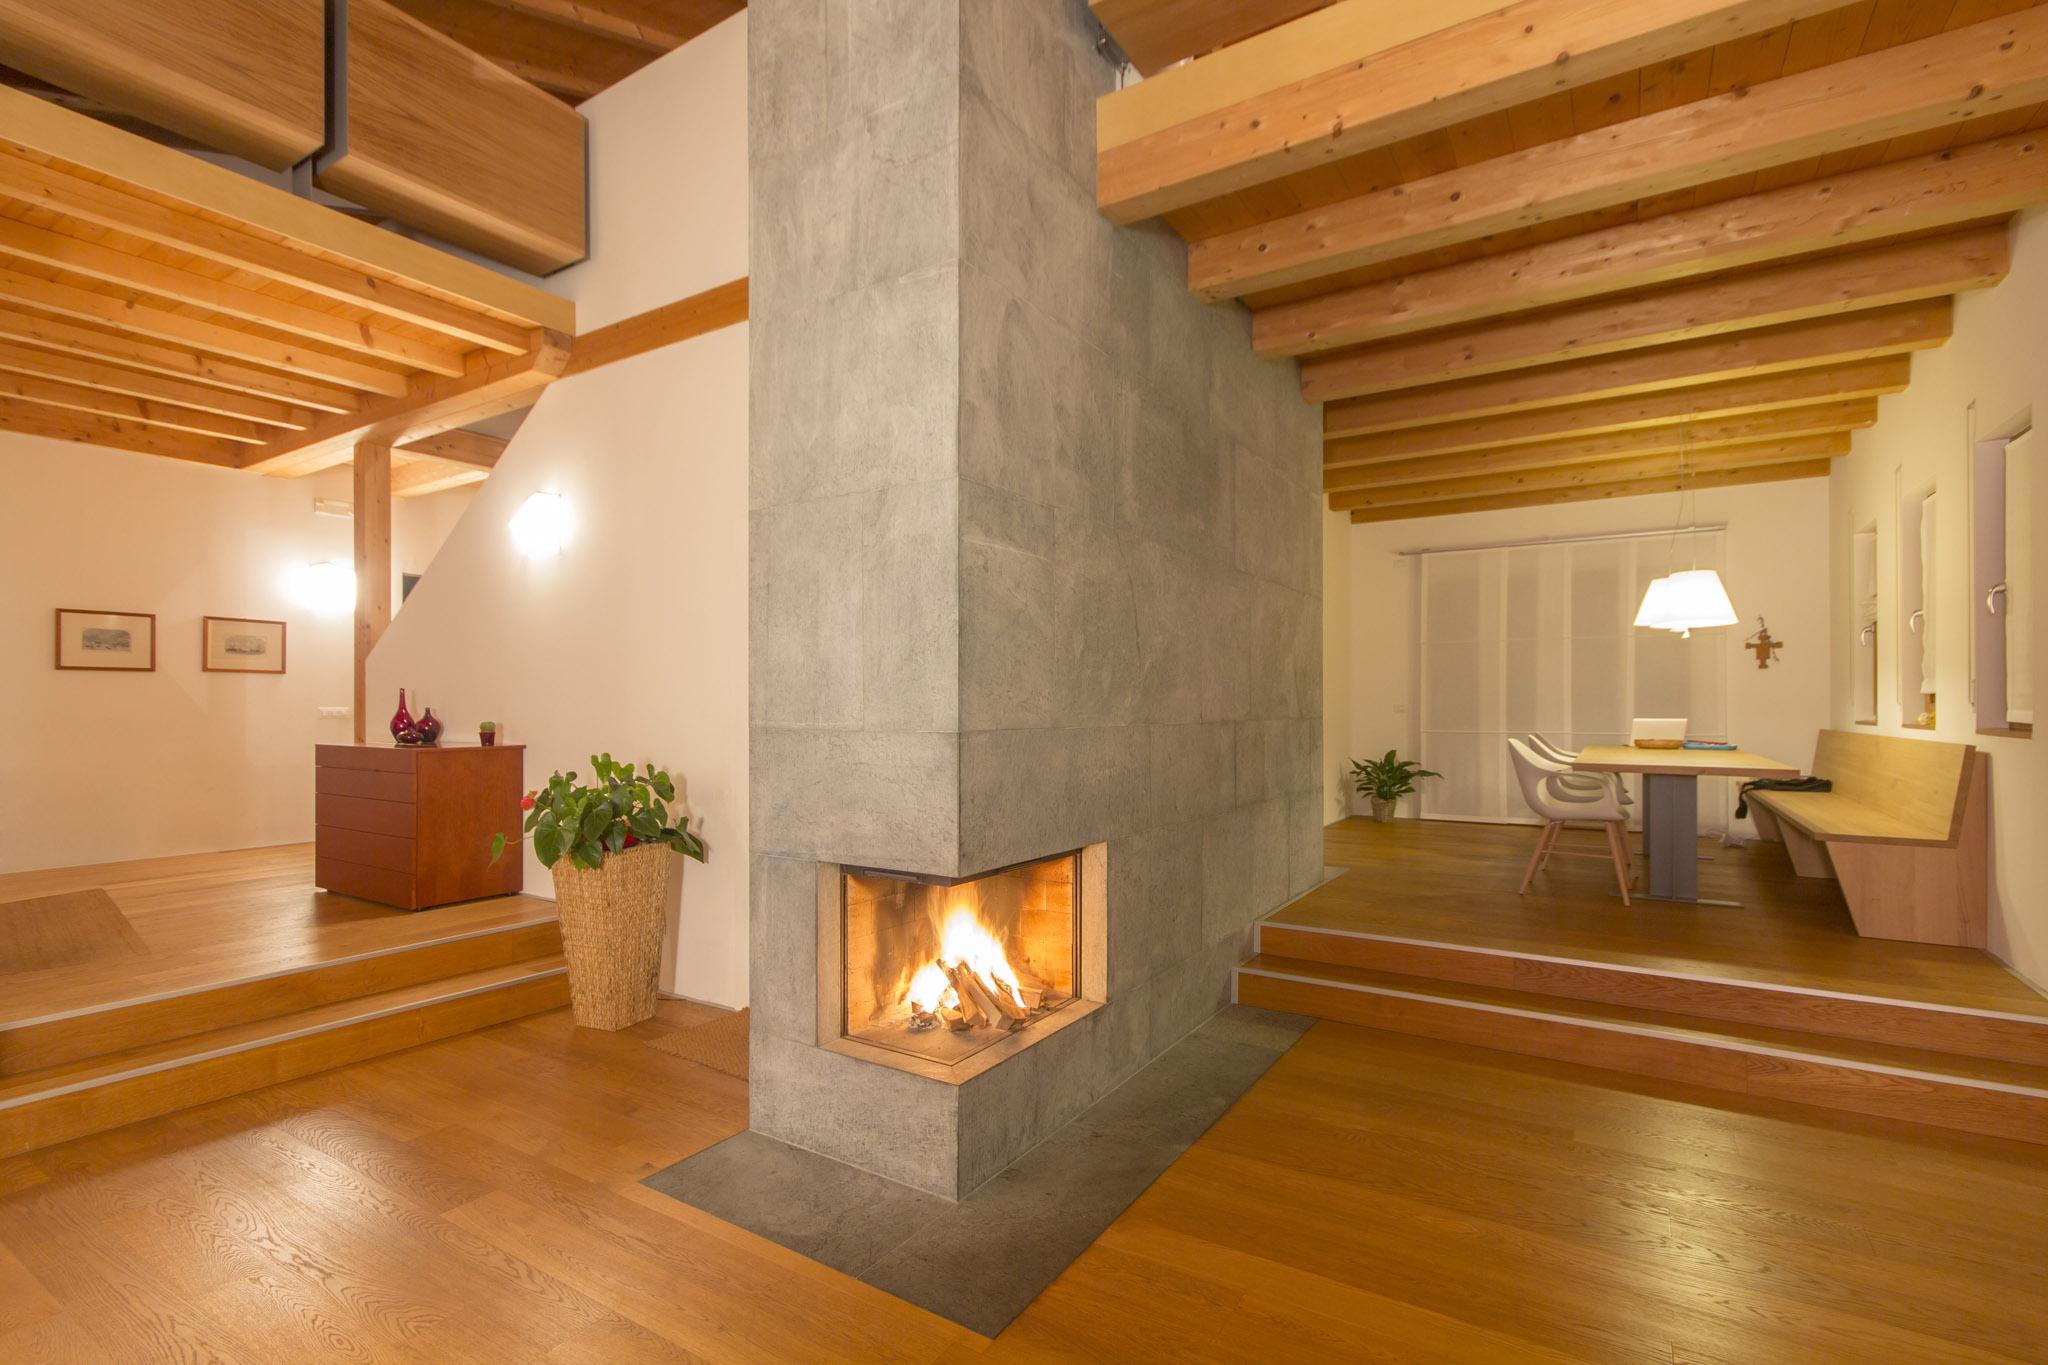 Raviscioni srl edilizia · stufe · pavimenti · ceramiche